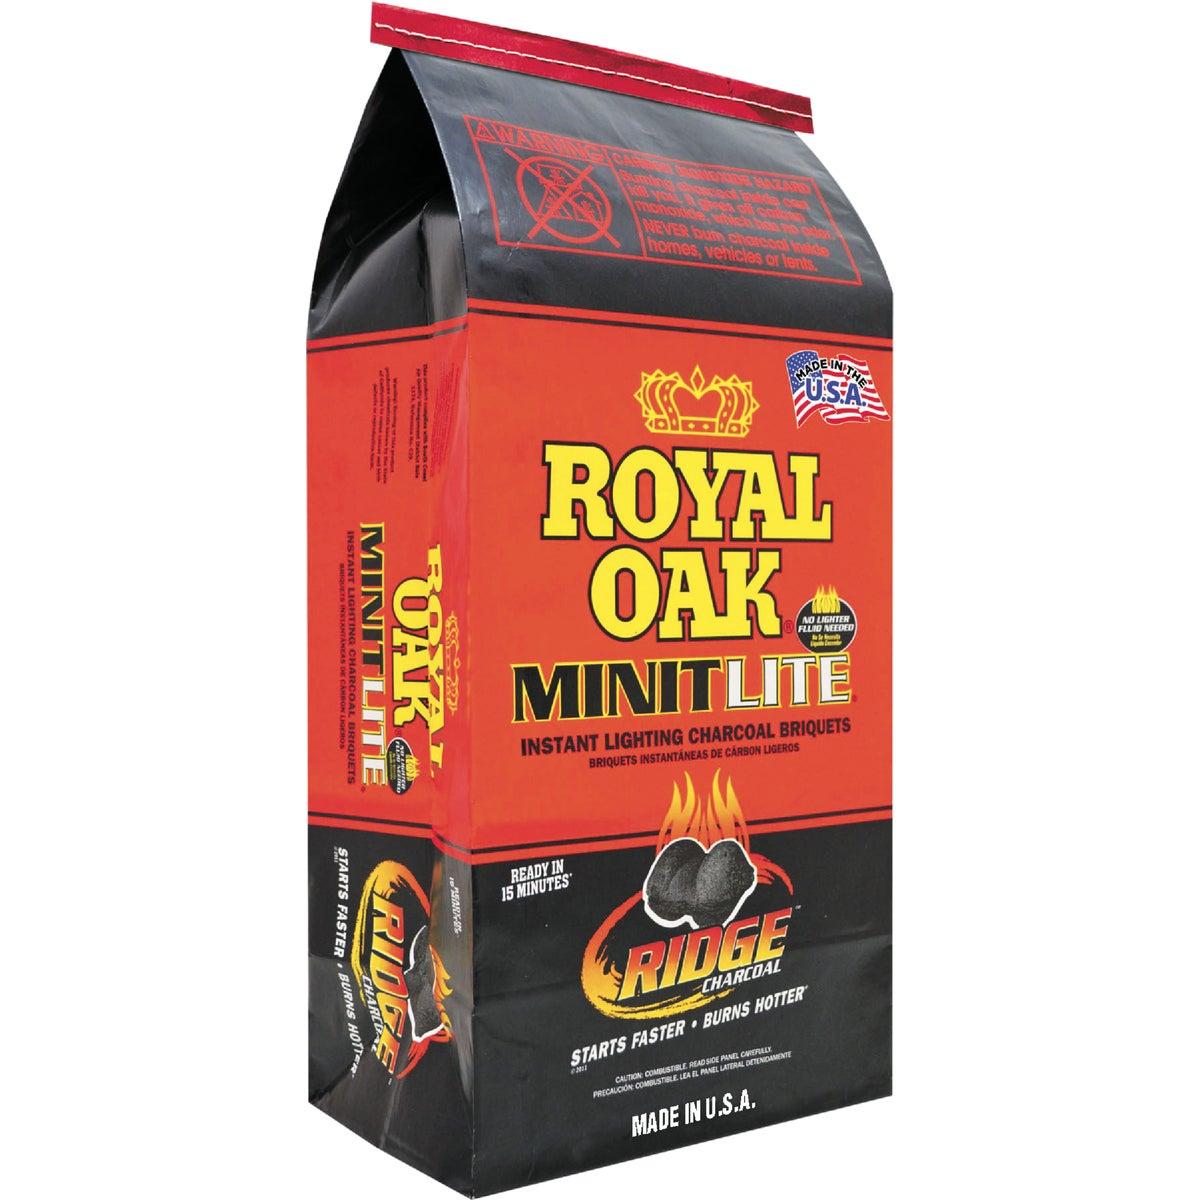 6.7LB MINIT LT CHARCOAL - 198-200-047 by Royal Oak